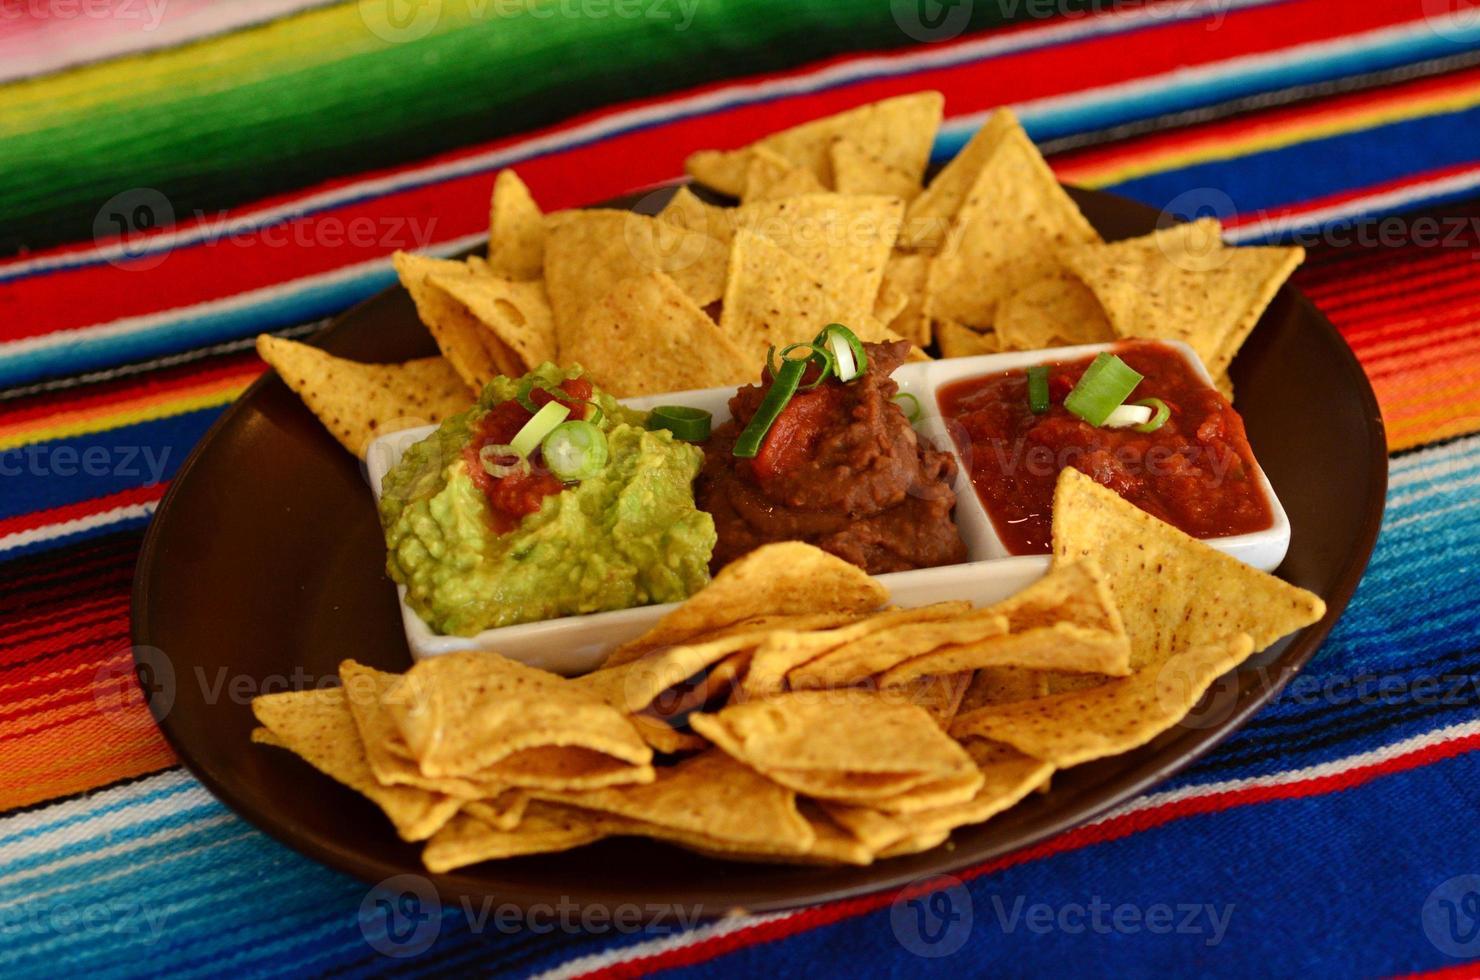 mexikansk mat - nachos foto